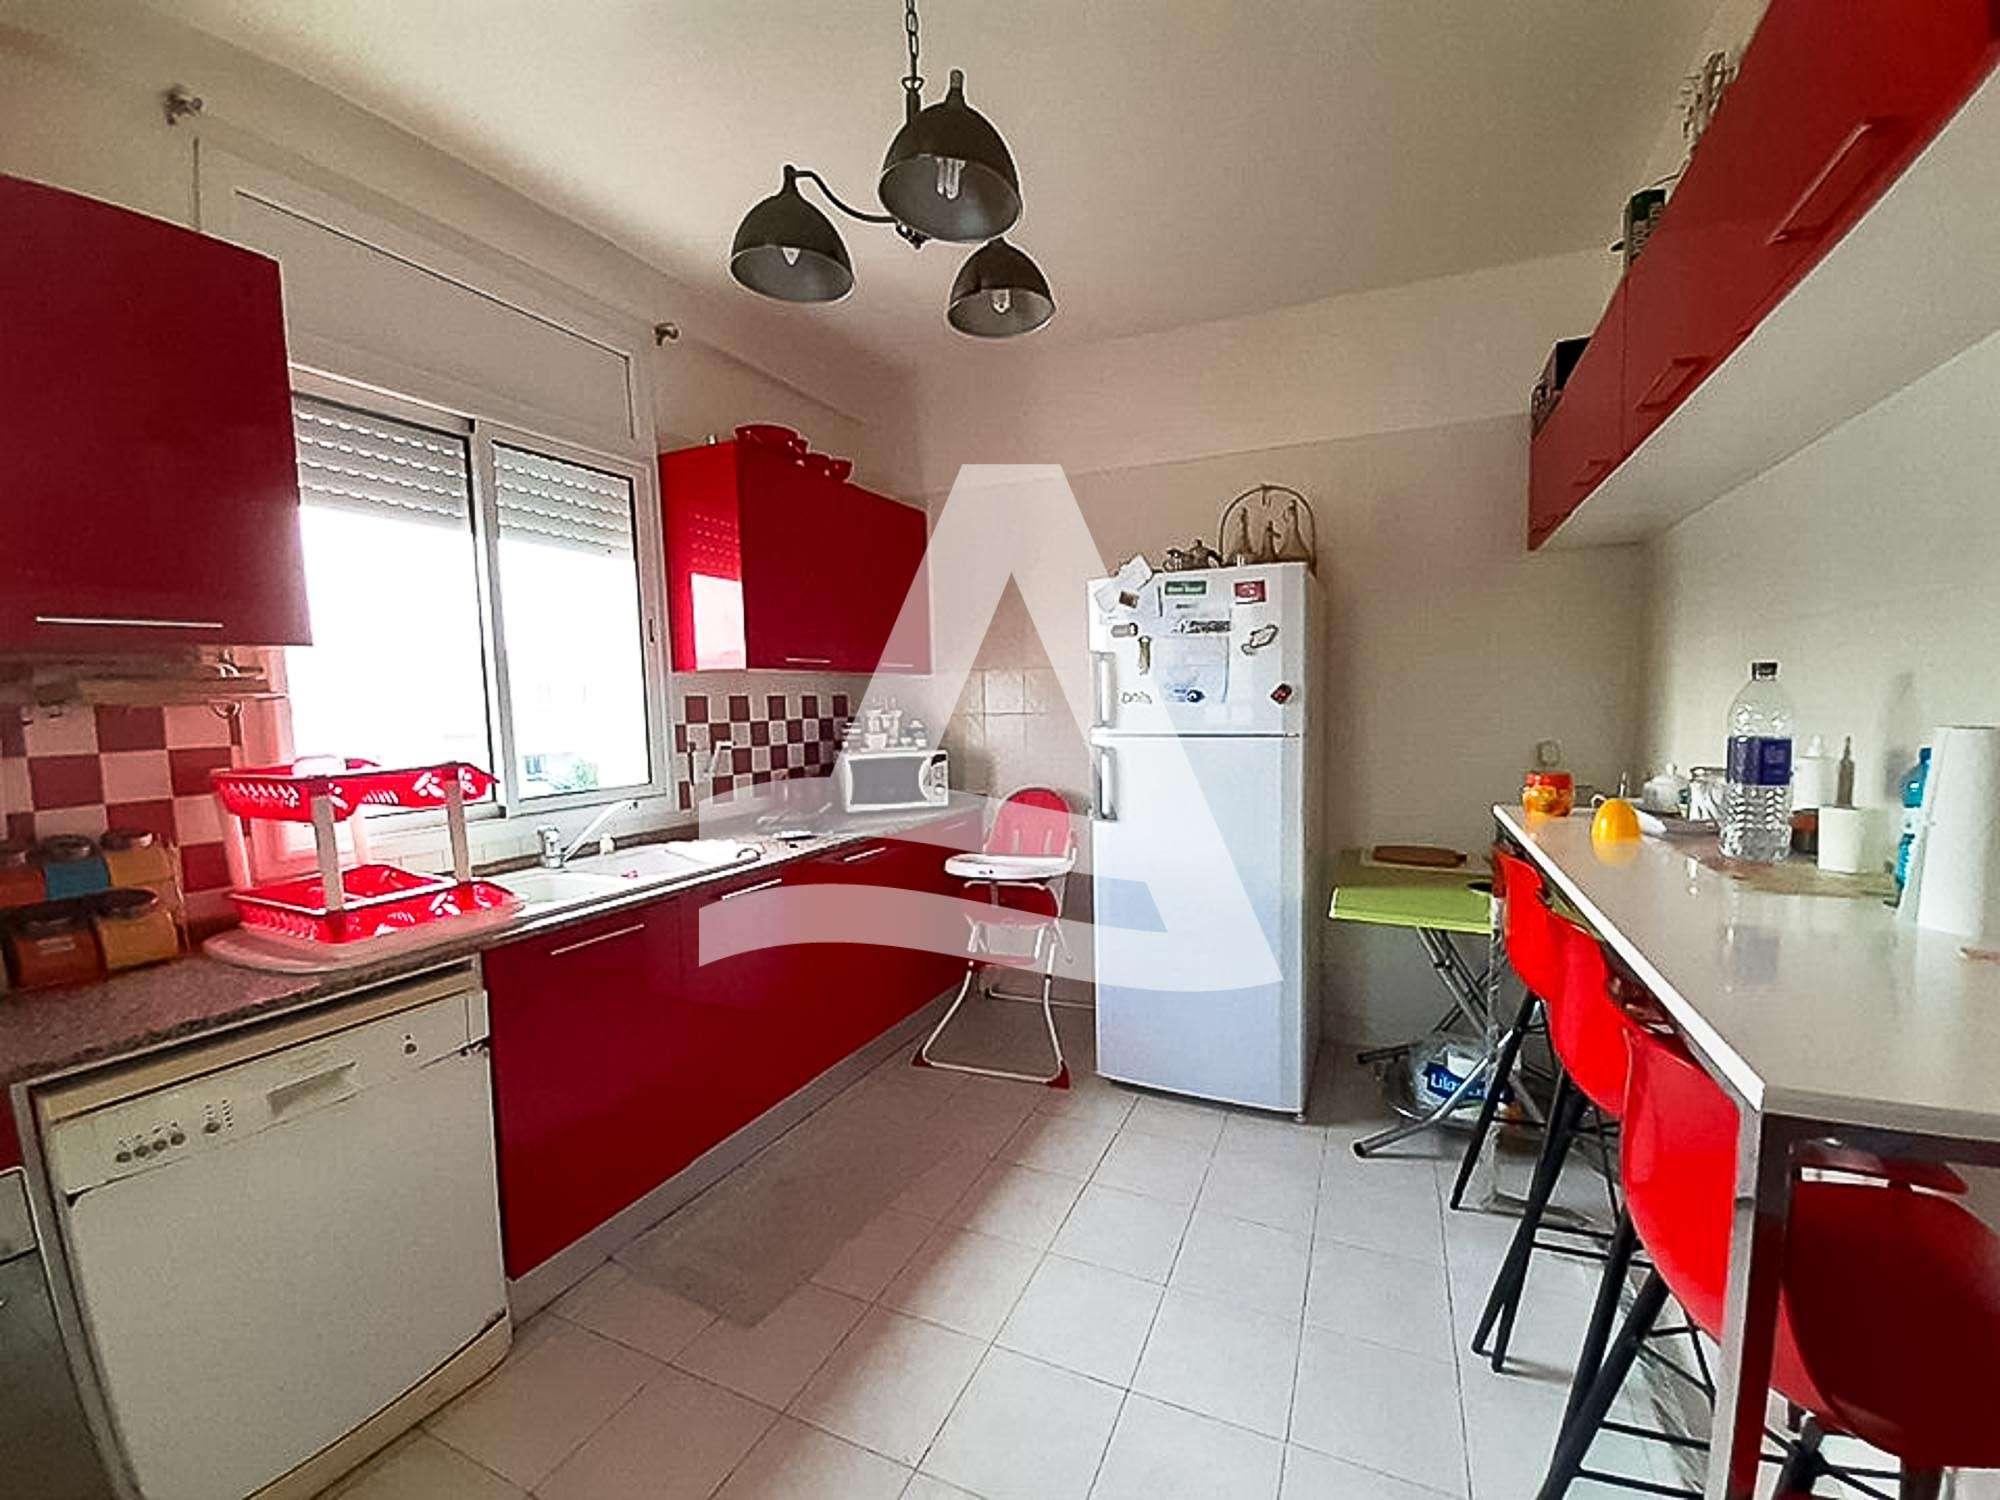 httpss3.amazonaws.comlogimoaws_Arcane_immobilière_la_Marsa-_location_-_vente_la_marsa_14_sur_16_1574071698447-1